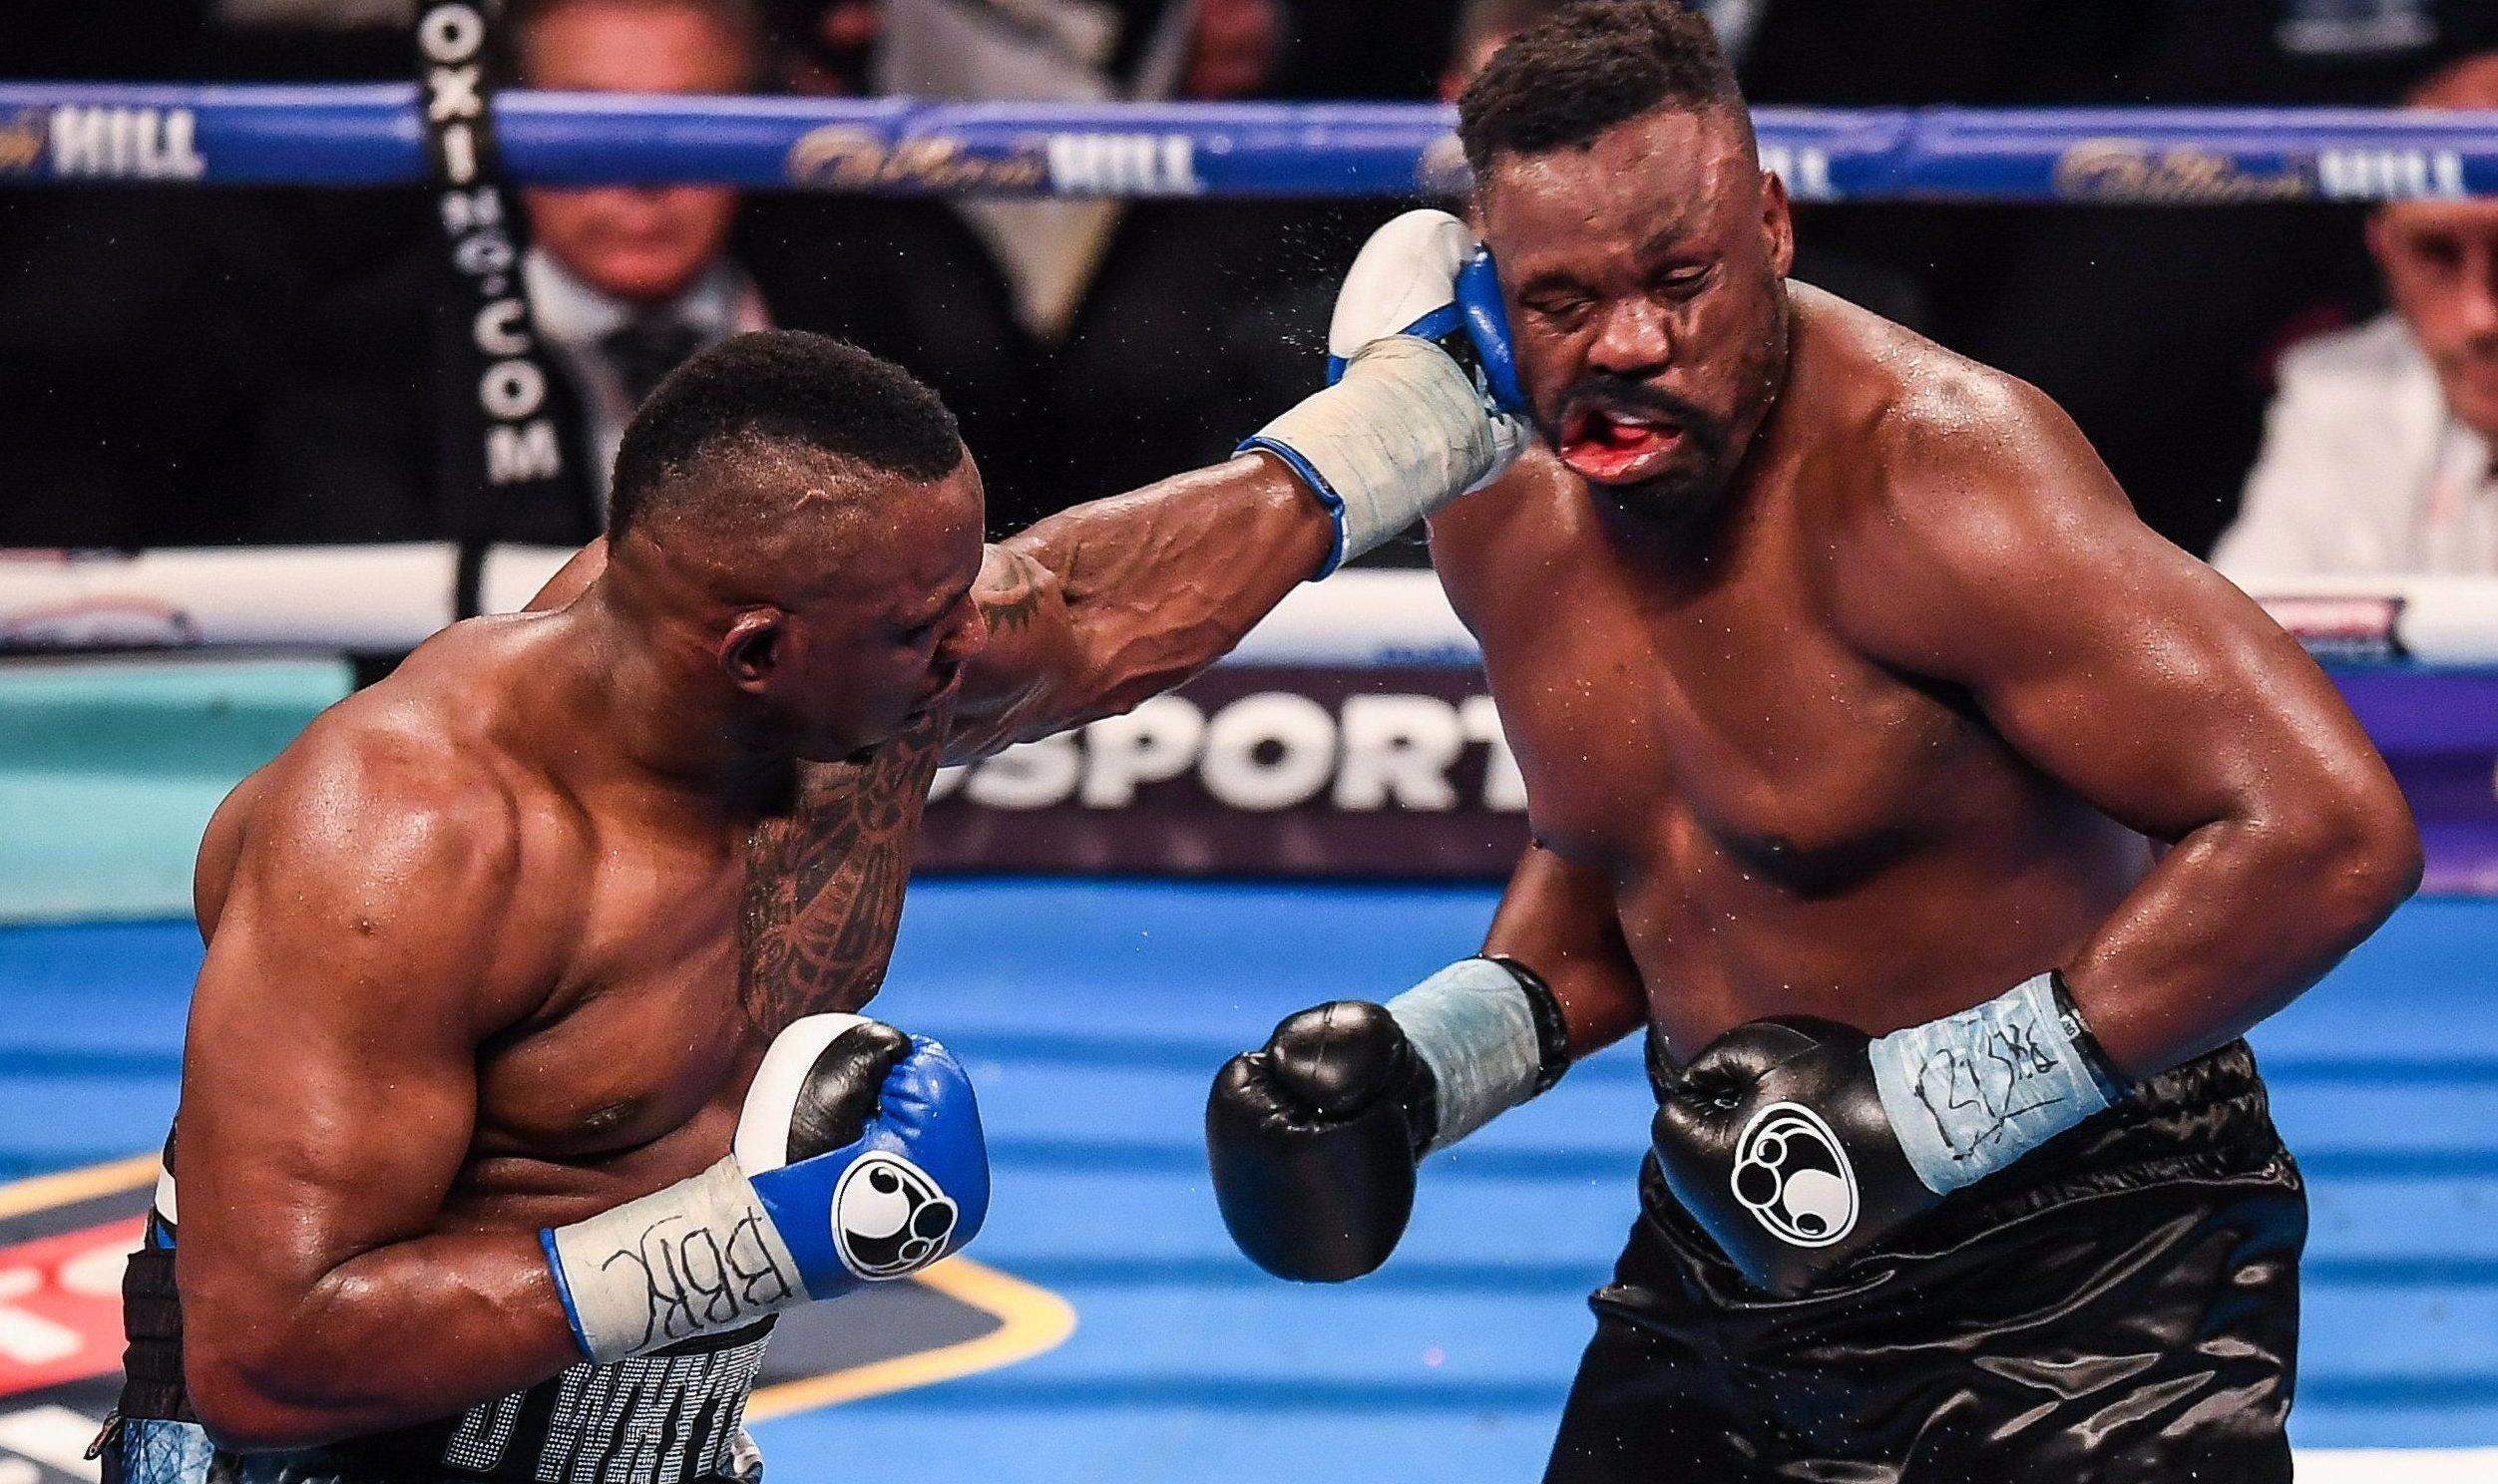 Dillian Whyte beat Dereck Chisora in 2016